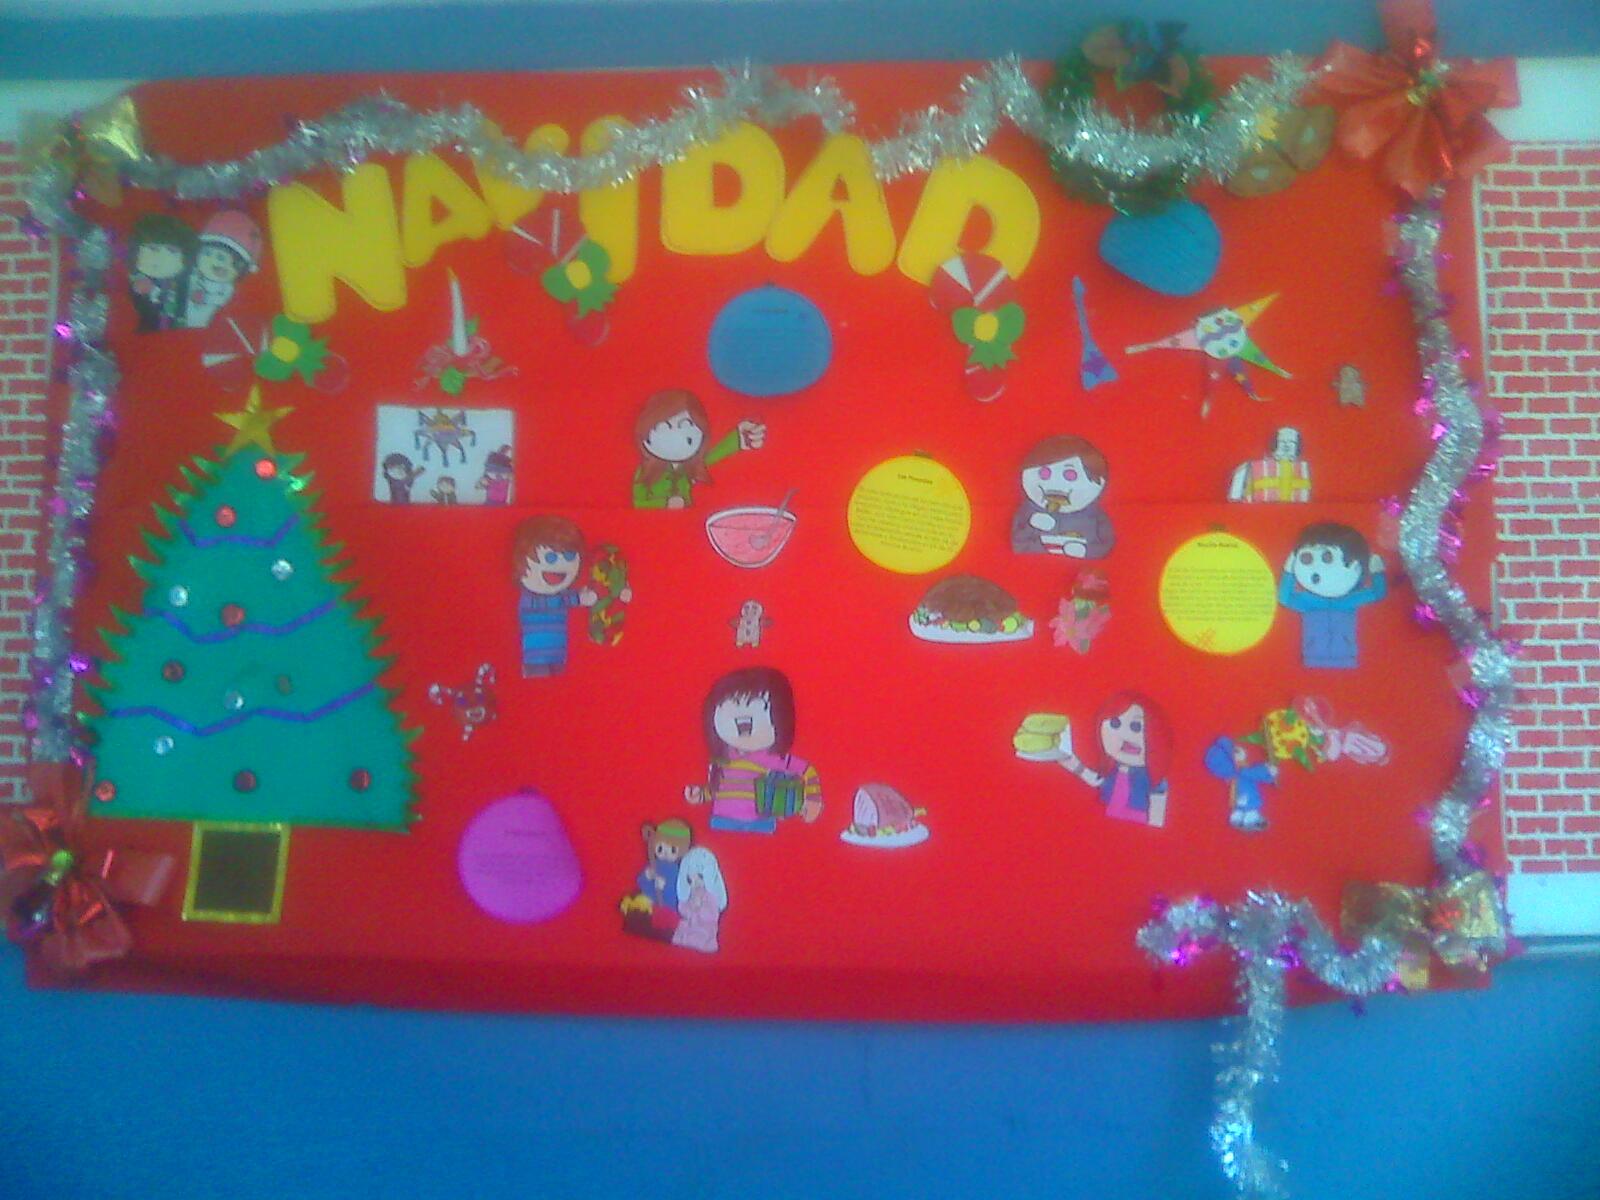 Daniel arturo canchola serrano - Mural navidad infantil ...